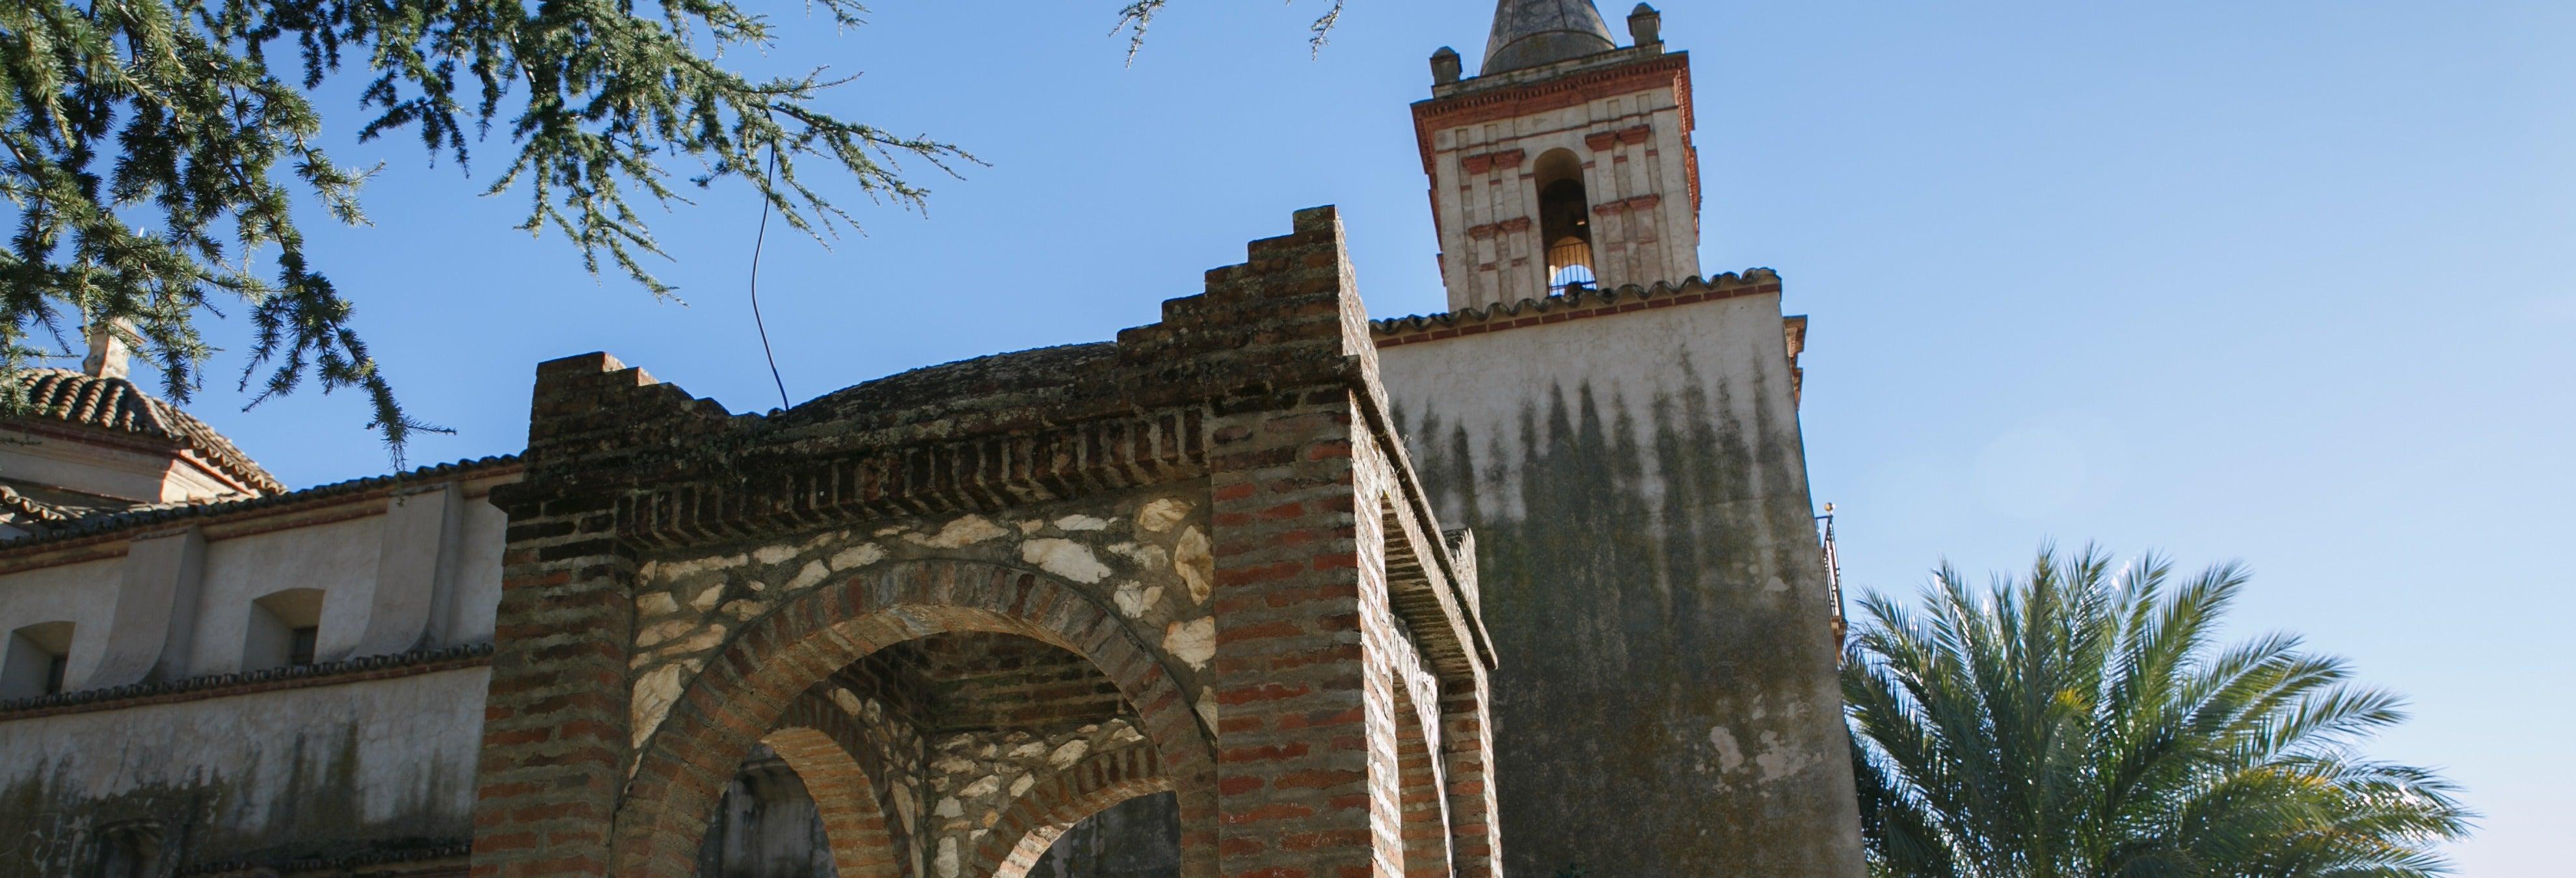 Tour privado por Linares de la Sierra ¡Tú eliges!